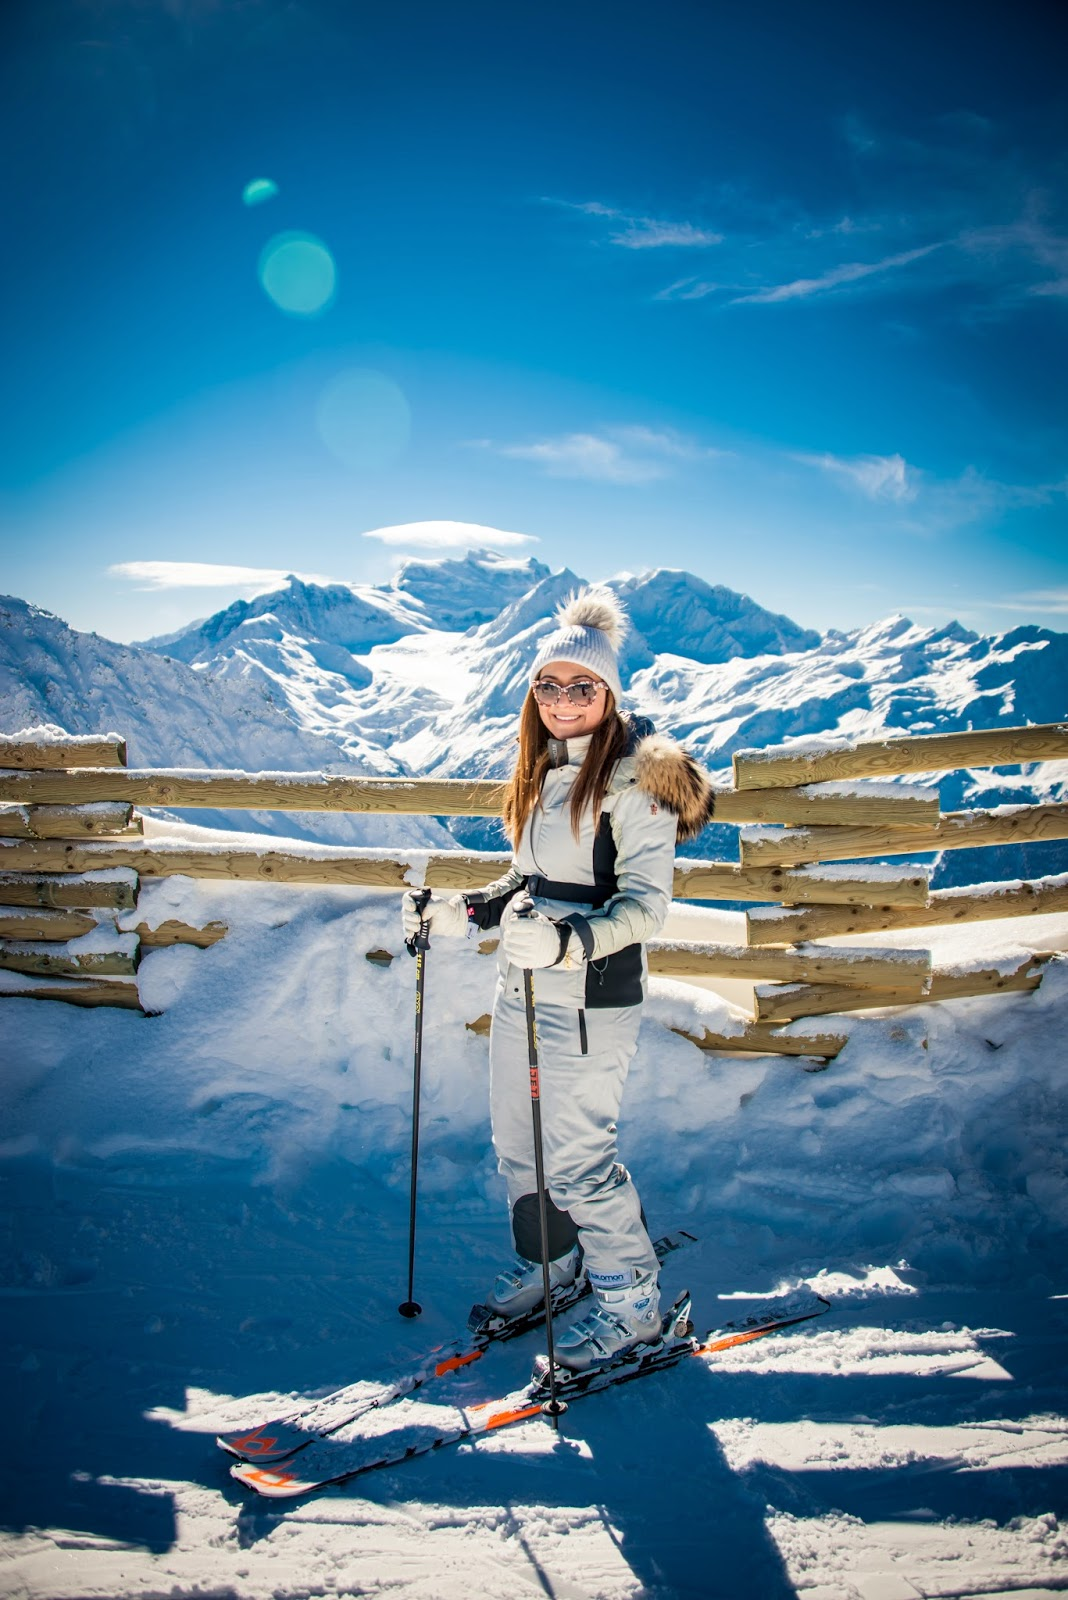 verbier-skiing-luxury-moncler-ski-suit-hanushka-toni